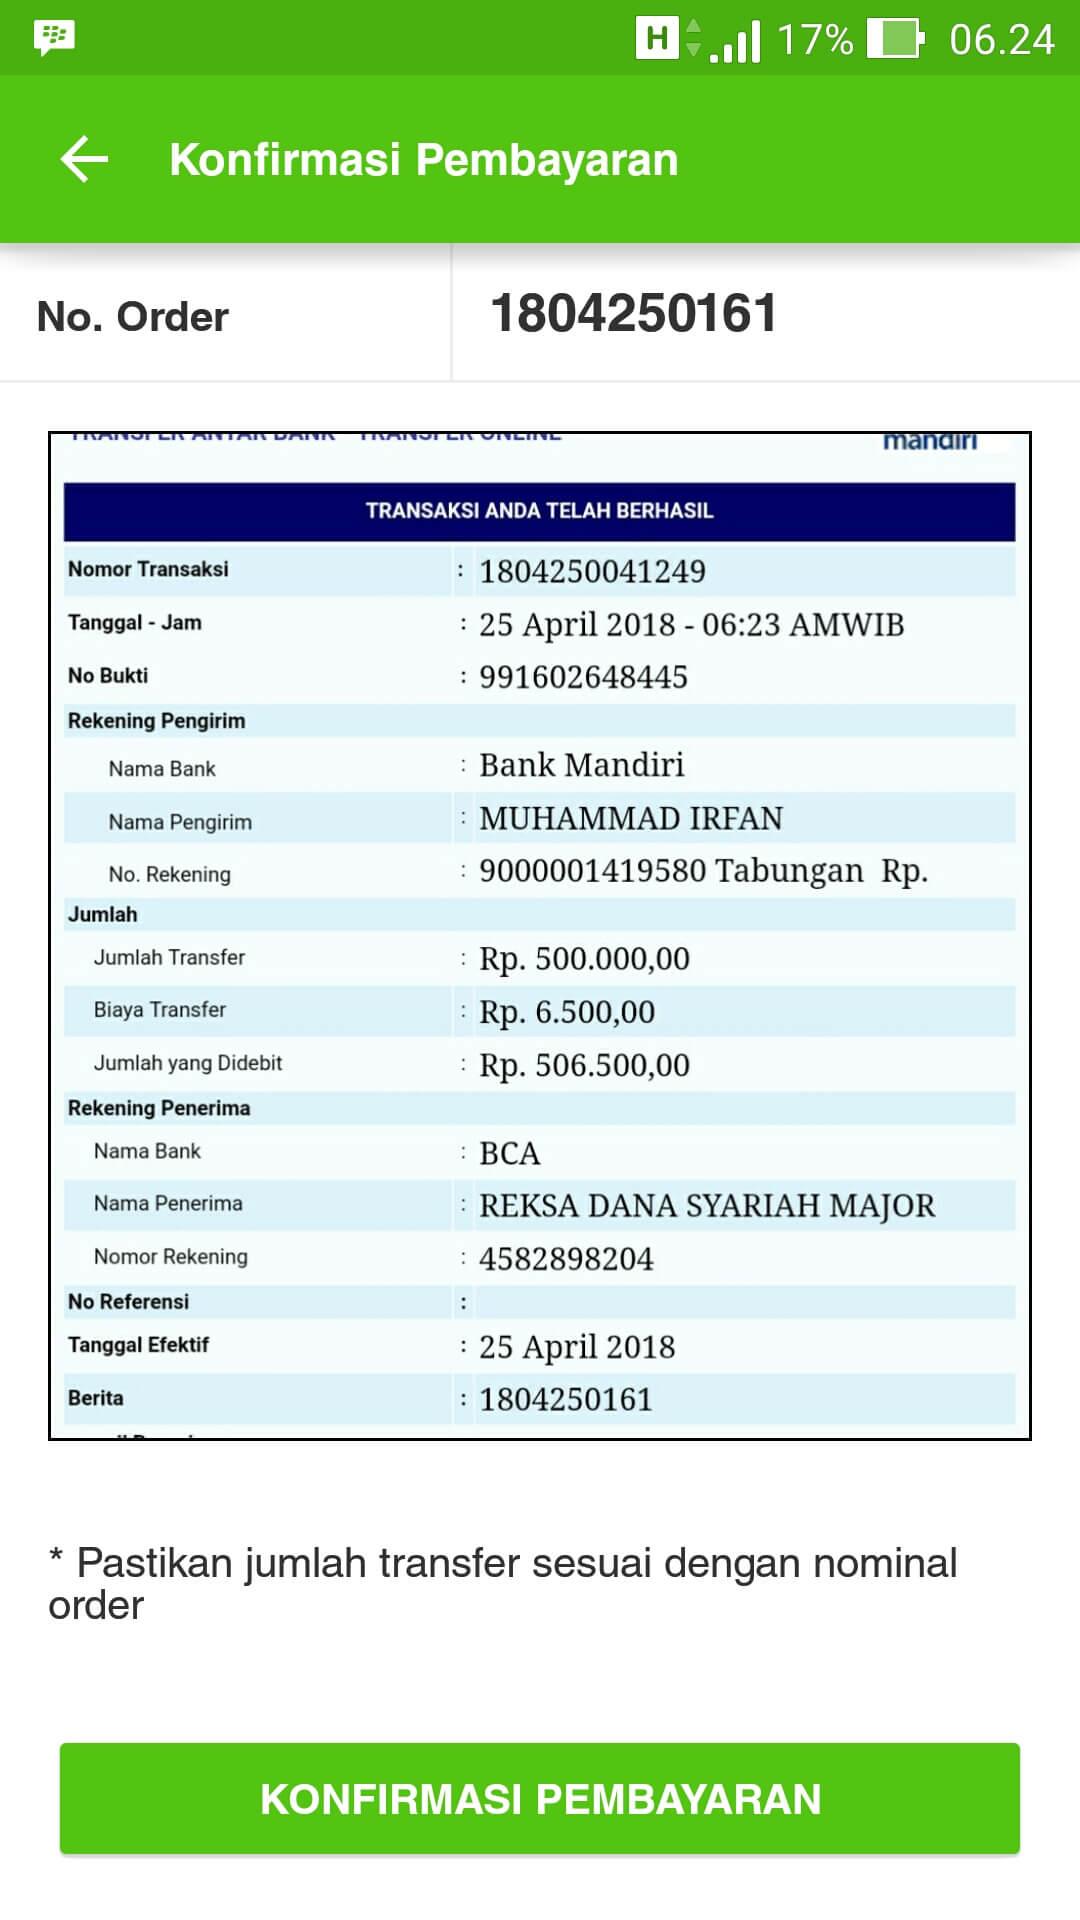 Cara Beli Reksa Dana Bareksa Melalui Website Dan Aplikasi (UPDATE: 21/4/2020) 39